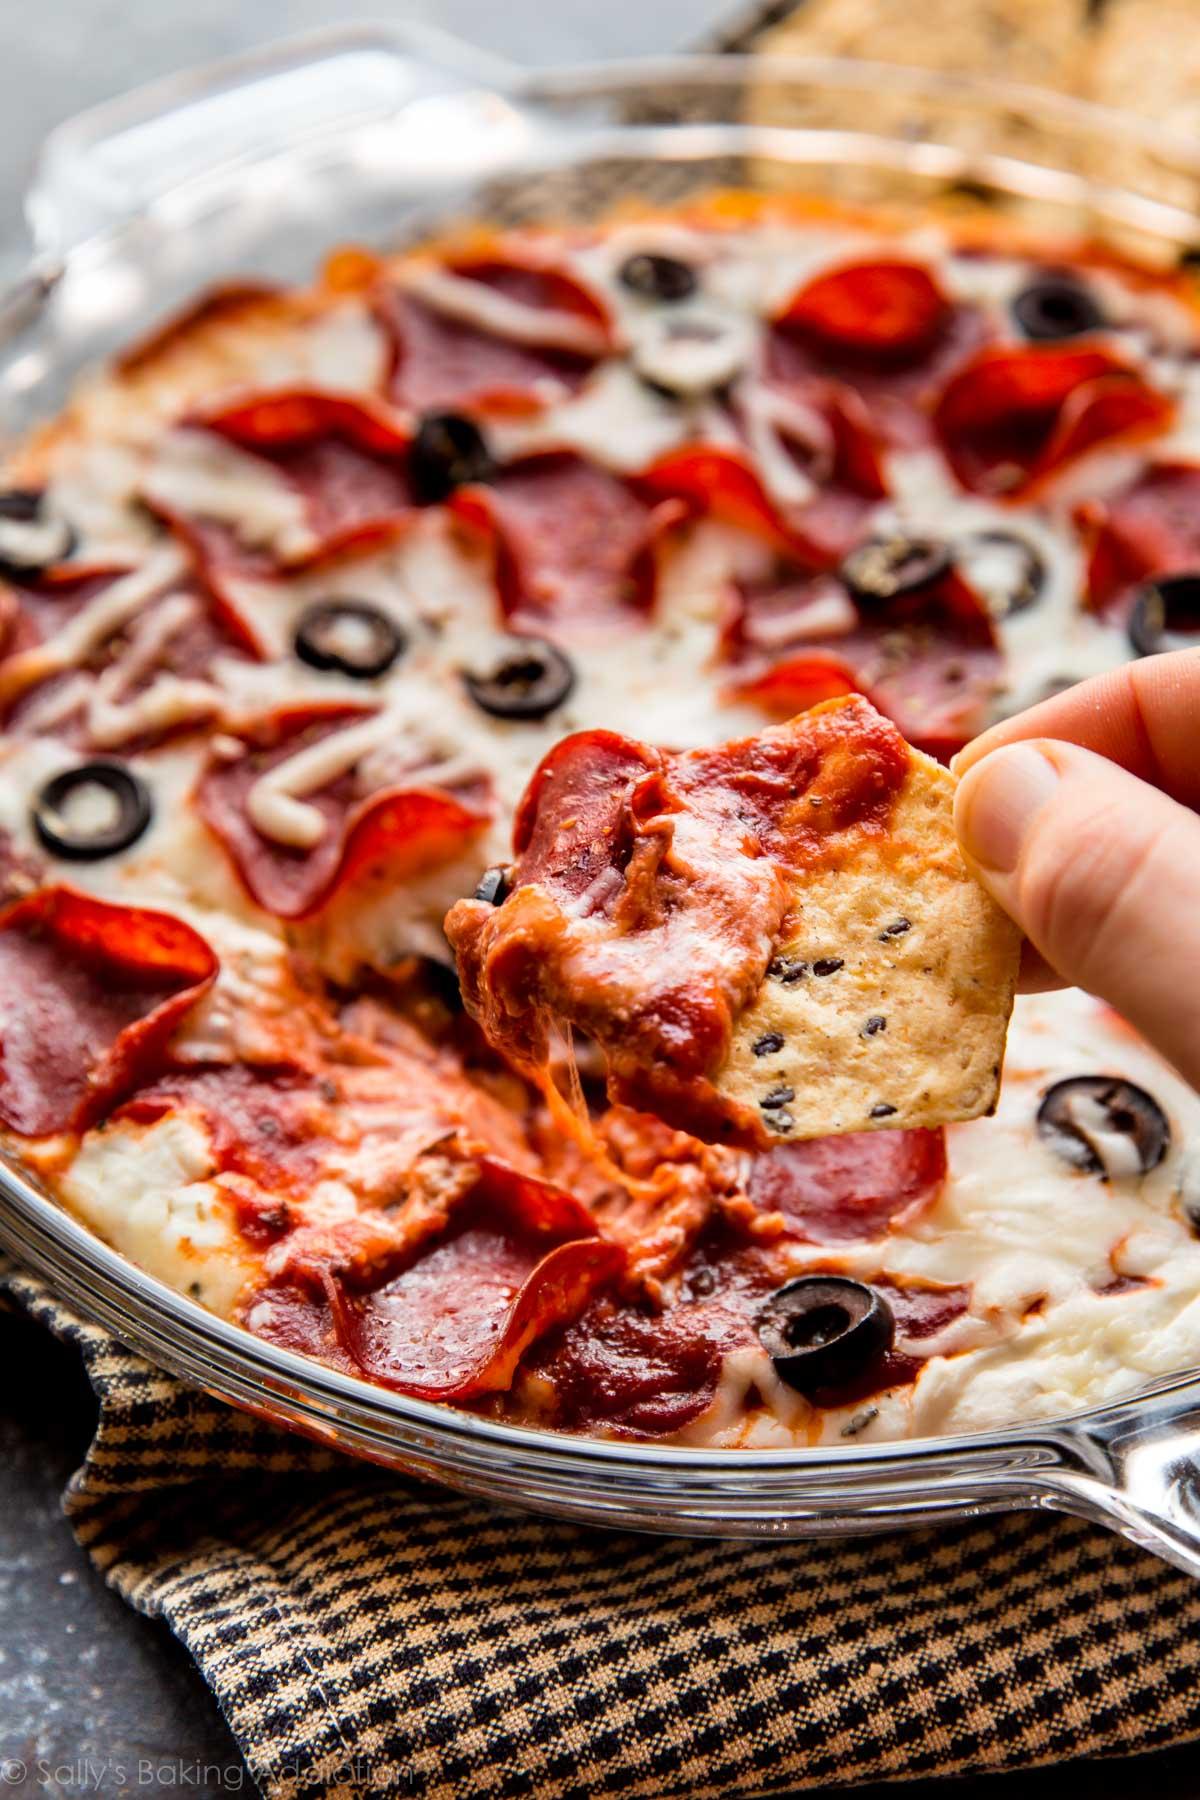 Quick & easy Lightened-Up Pepperoni Pizza Dip using Greek yogurt-- this is my favorite pizza dip recipe! sallysbakingaddiction.com